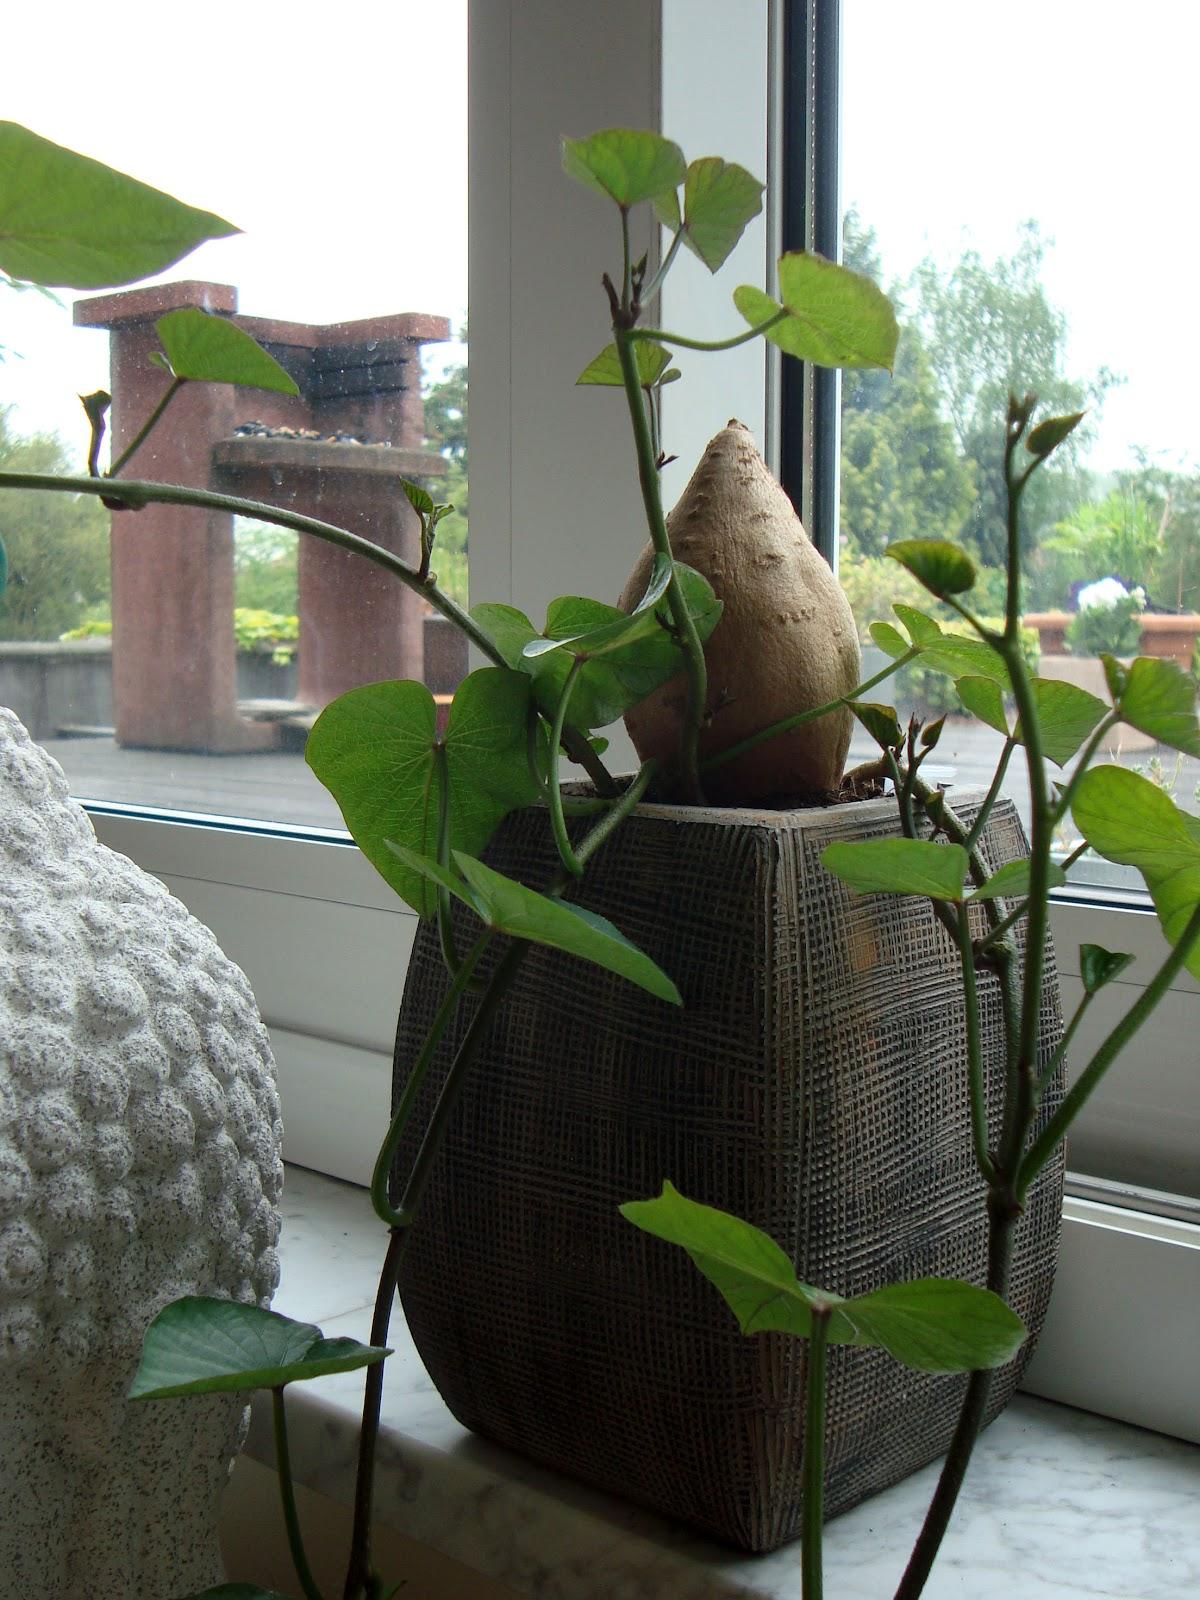 xx garden la patate douce. Black Bedroom Furniture Sets. Home Design Ideas